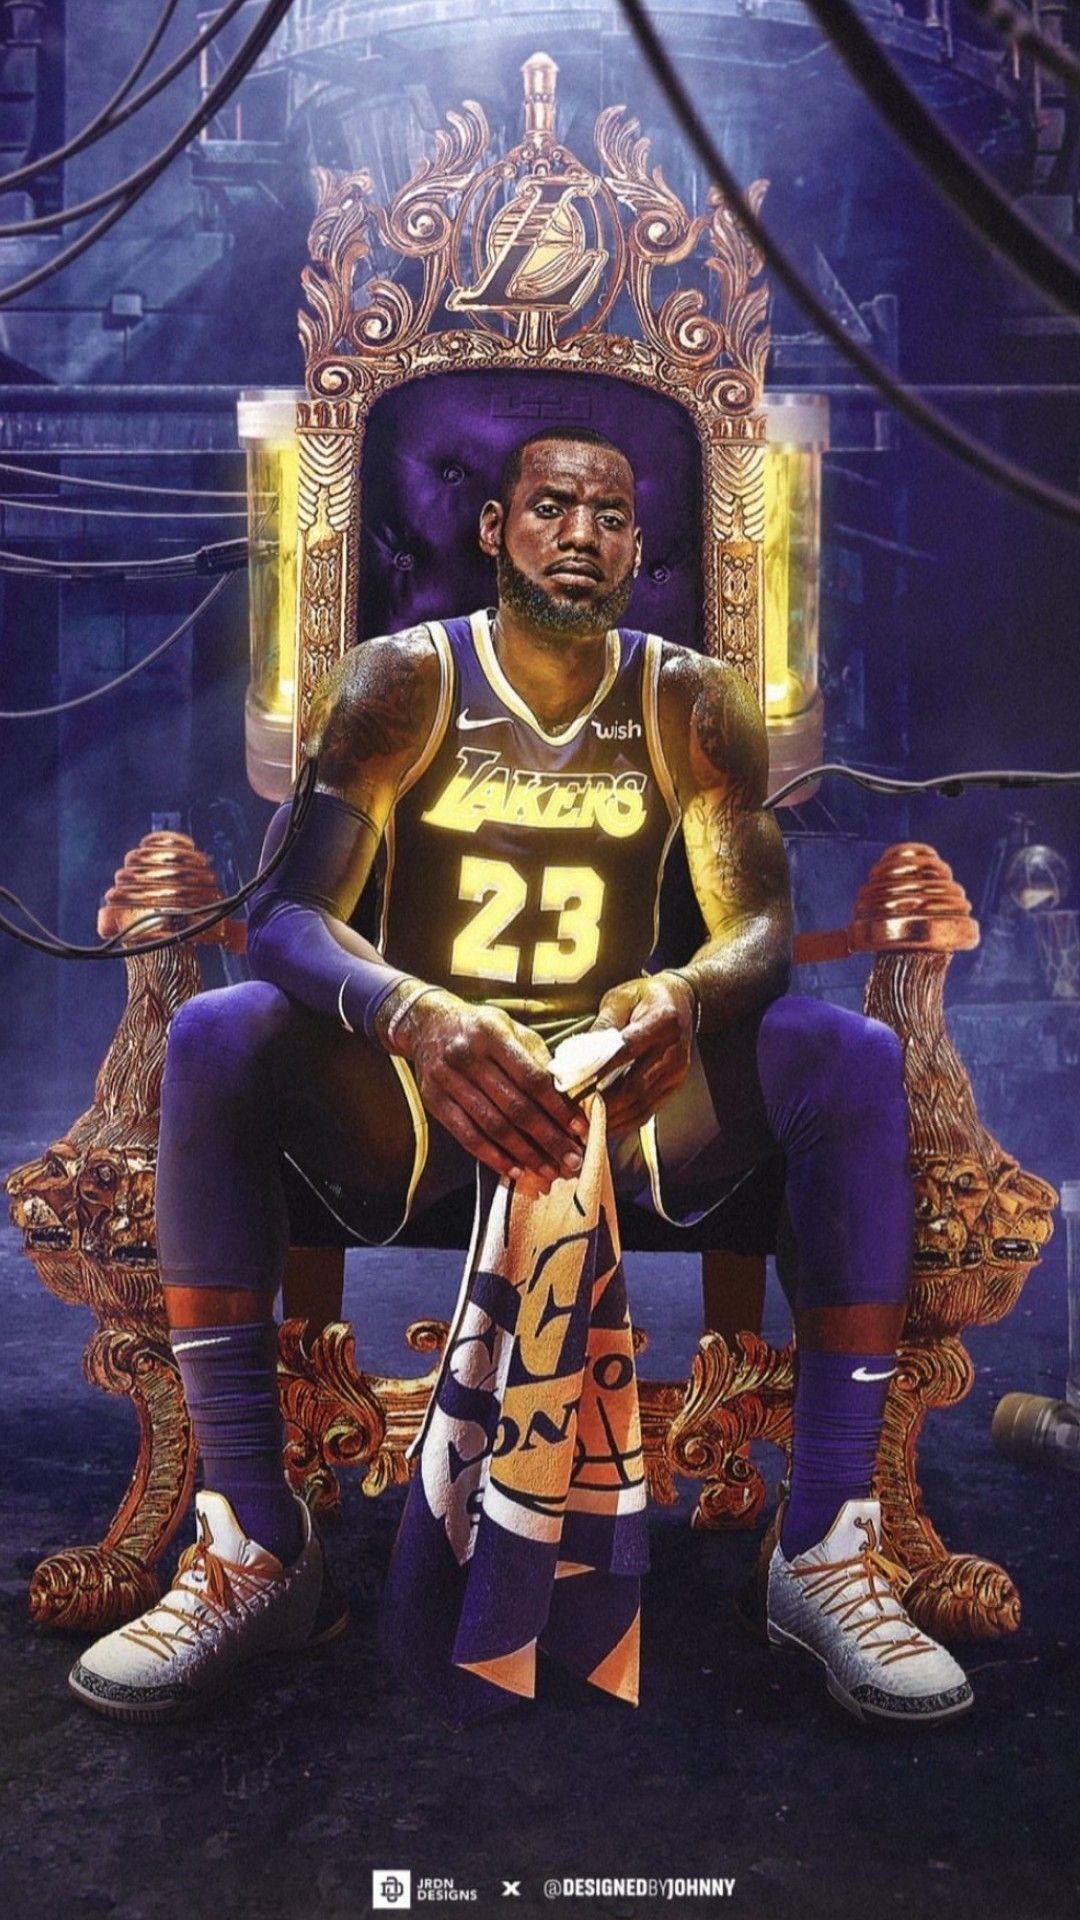 LeBron James wallpaper nba LeBron James wallpaper in 2020 1080x1920